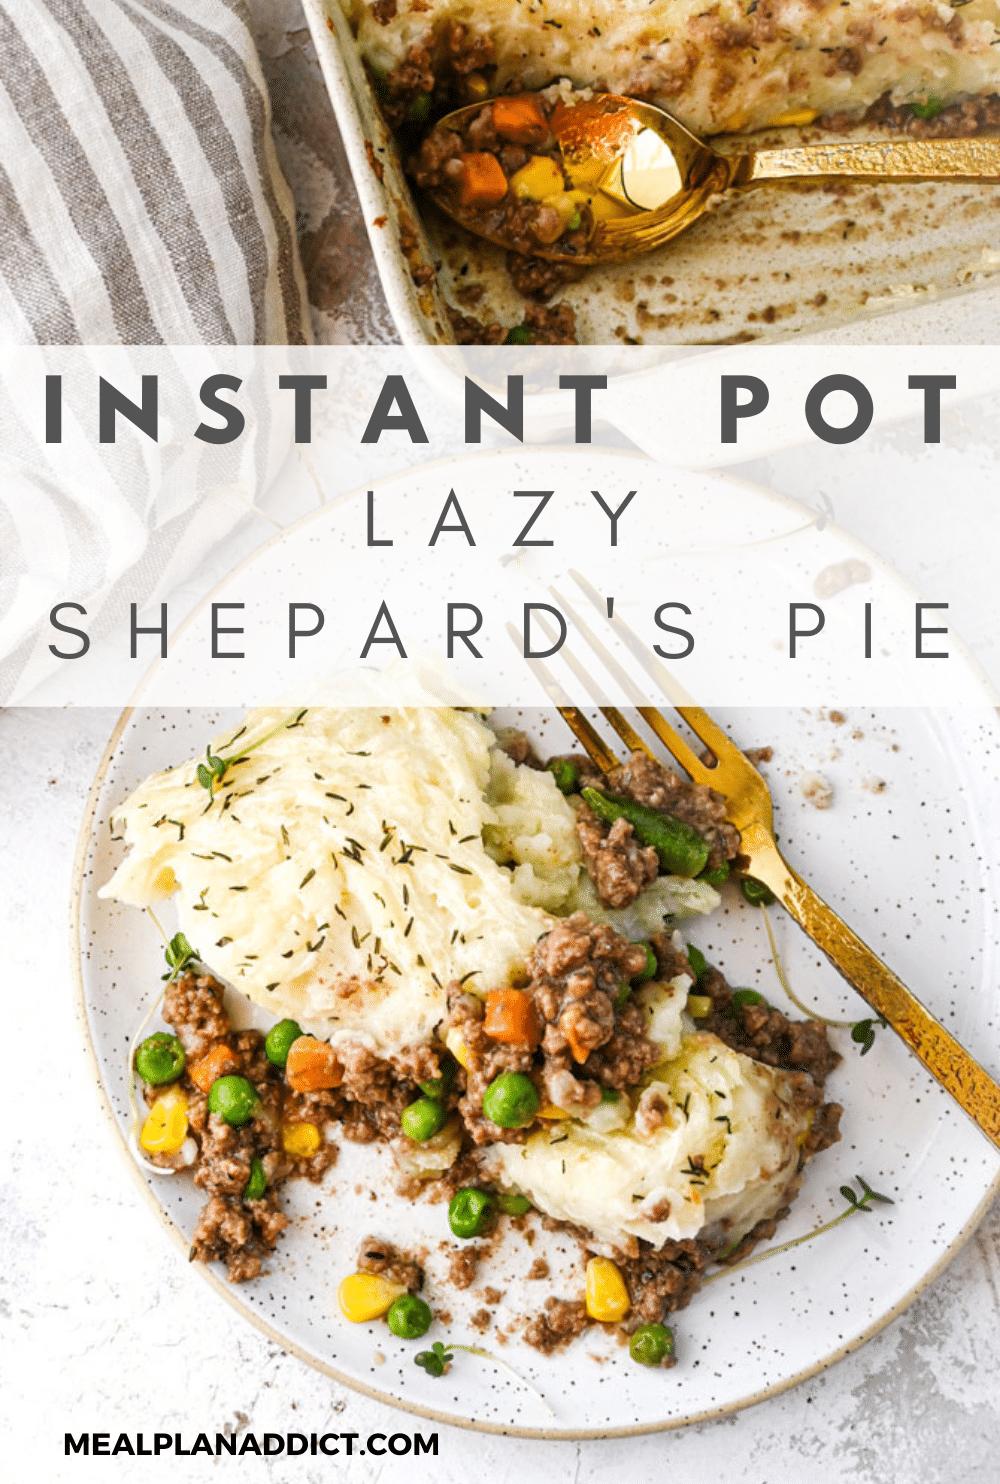 Instant Pot Lazy Shepards Pie Recipe | Meal Plan Addict